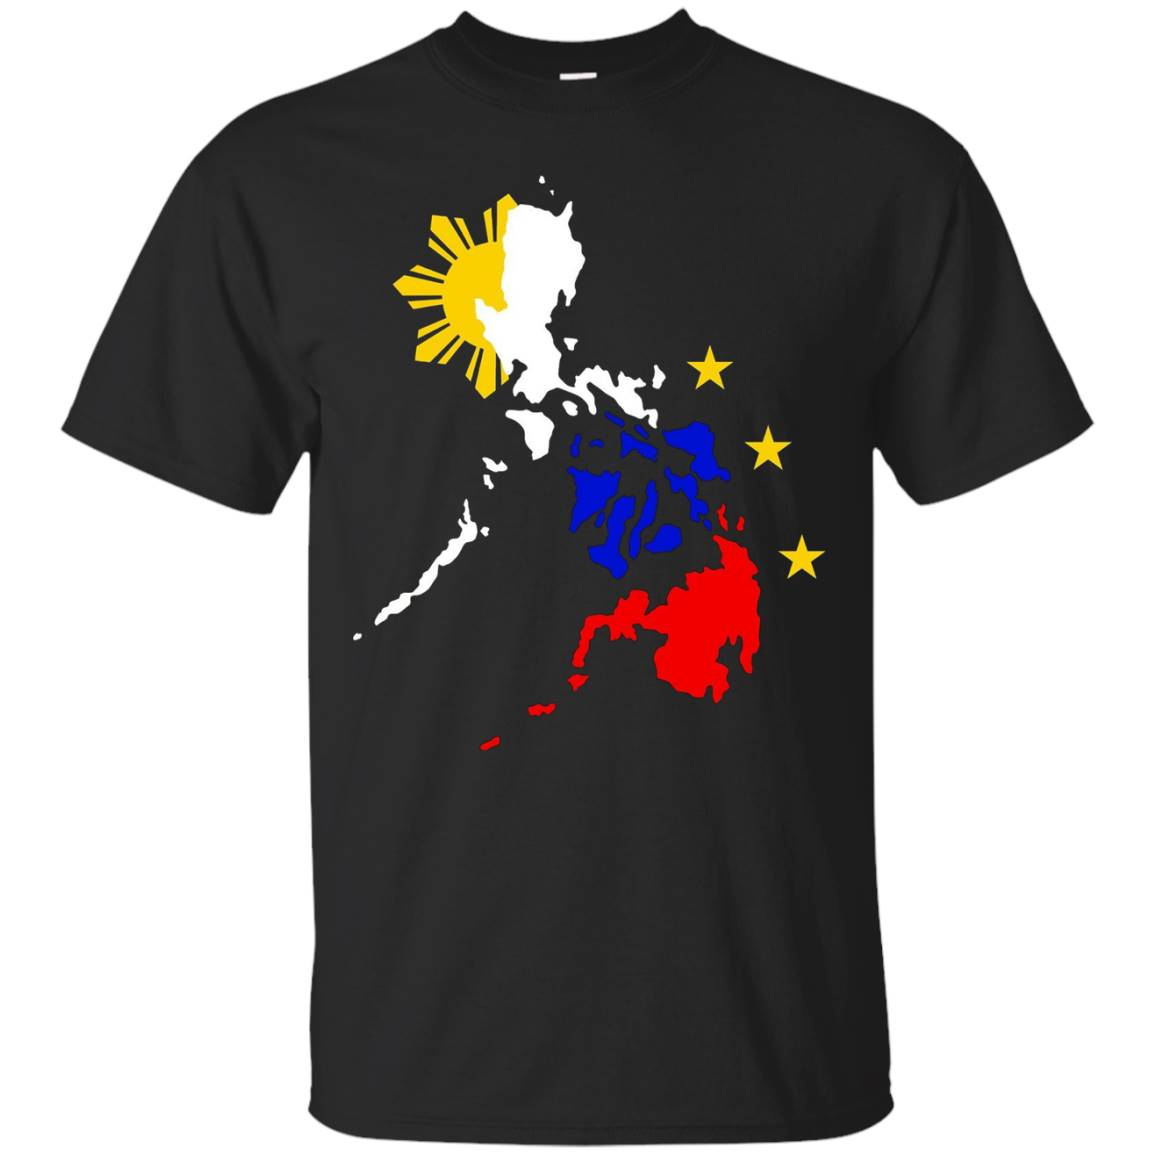 Philippines Map Shirt for Men, Women & Kids